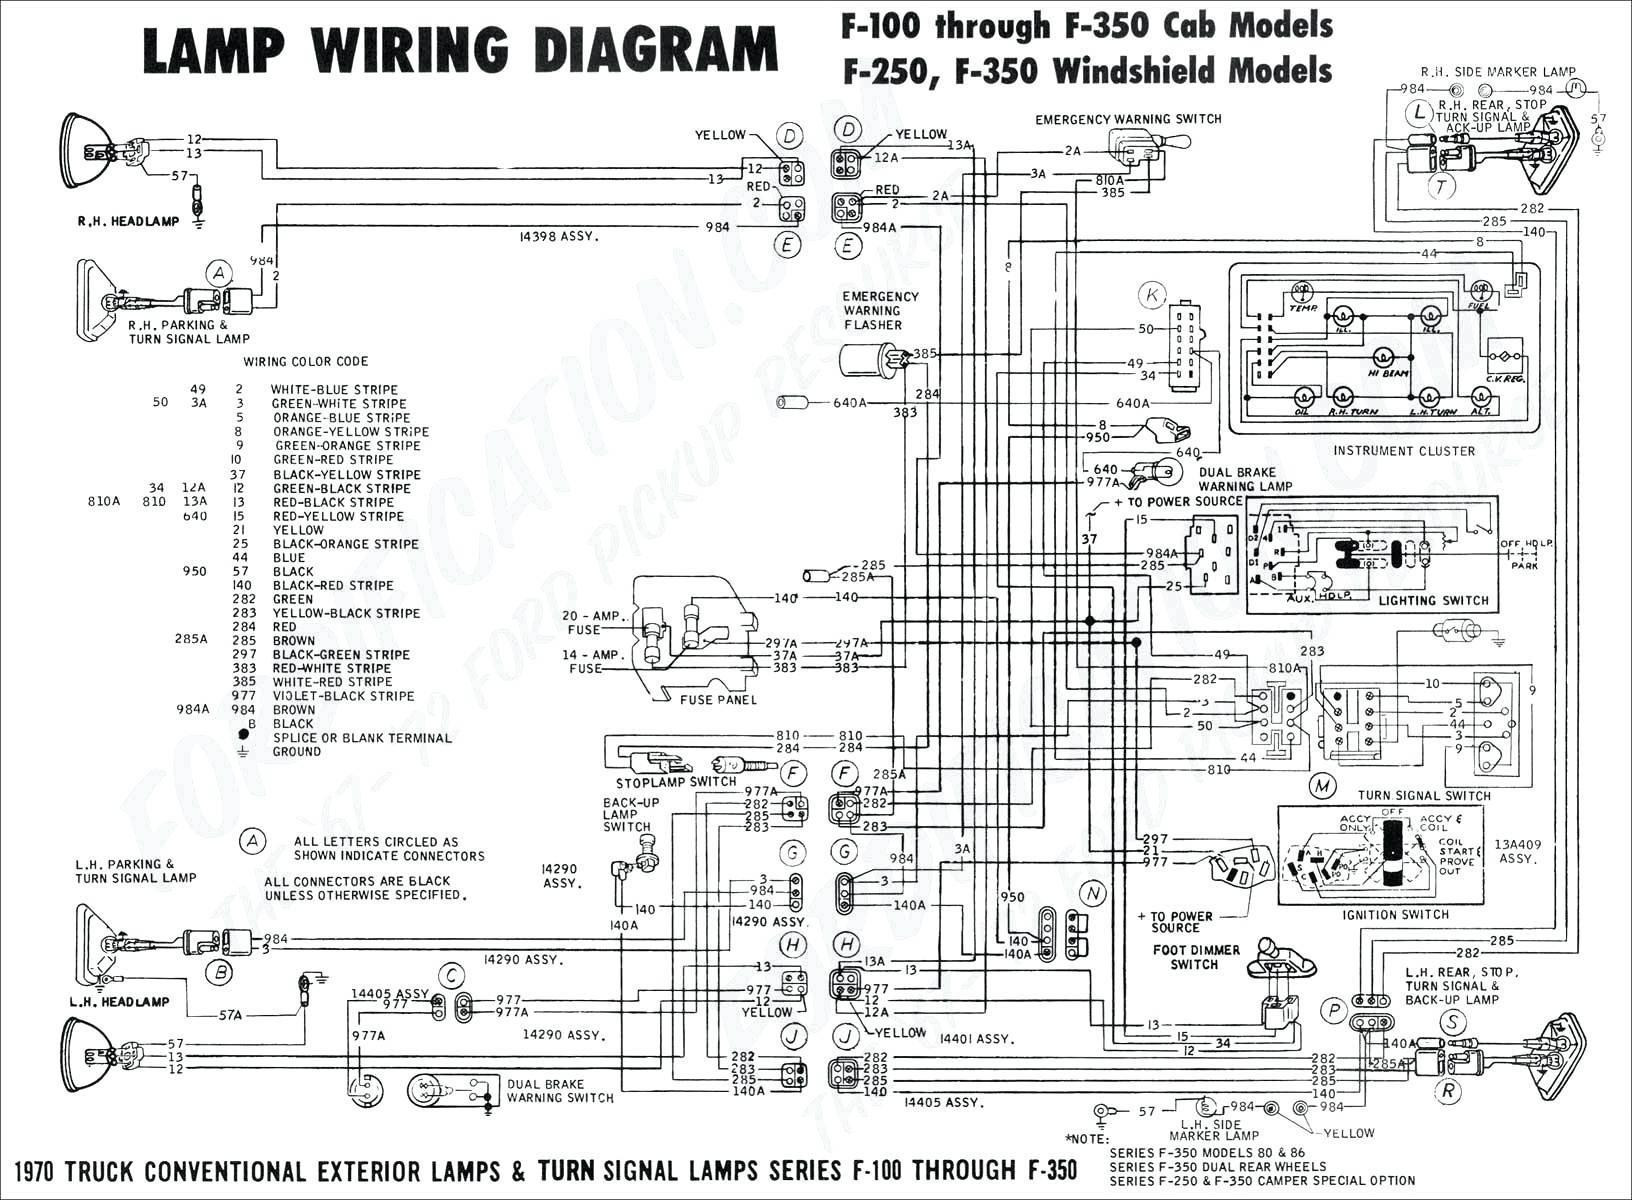 Chevrolet Truck Wiring Diagrams 2010 Chevy Truck Wiring Diagram Wiring Diagram toolbox Of Chevrolet Truck Wiring Diagrams